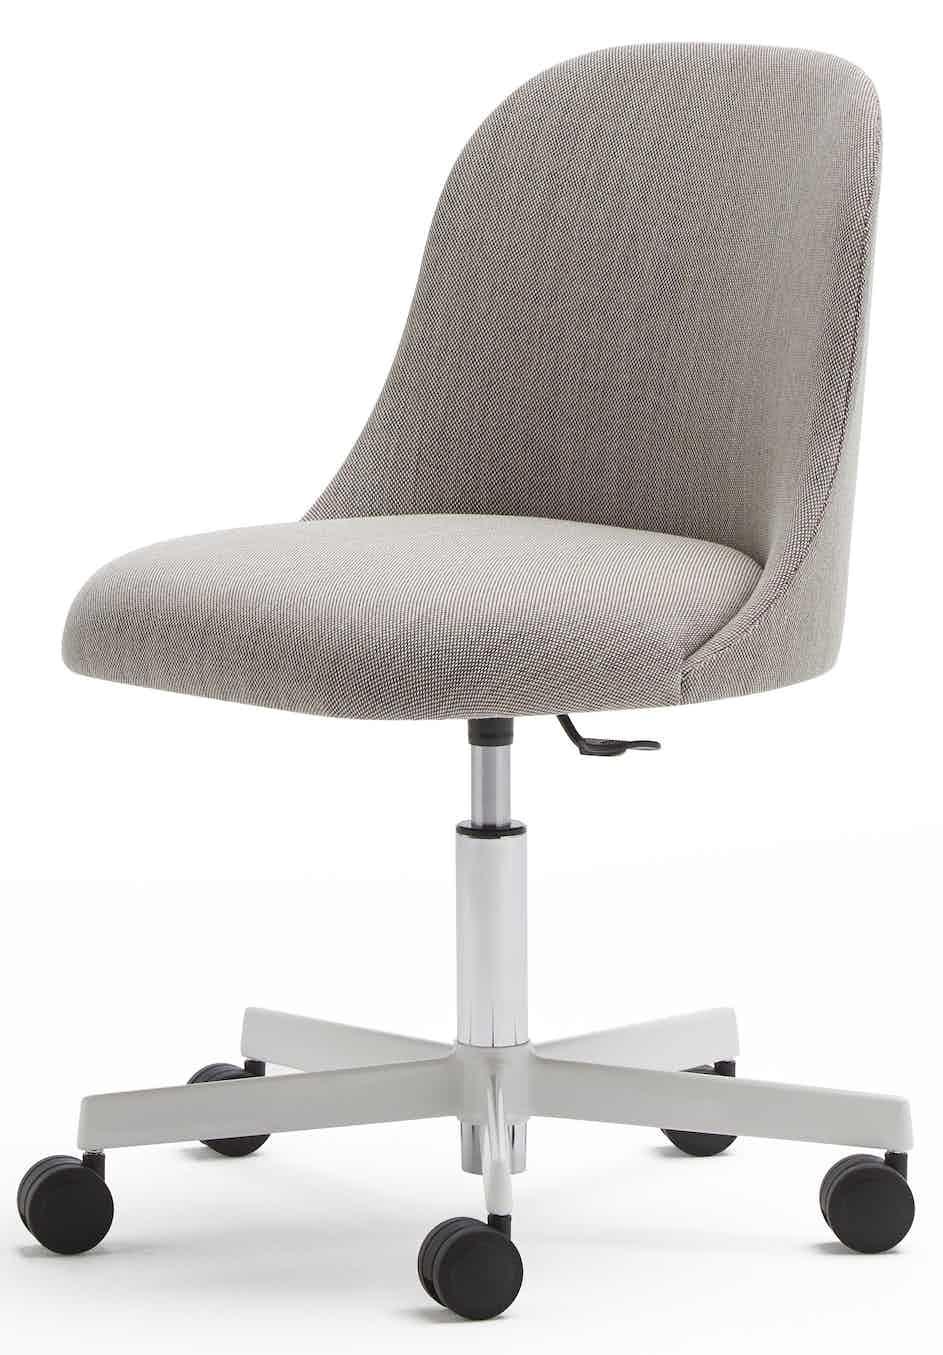 Viccarbe-chrome-leg-office-aleta-haute-living